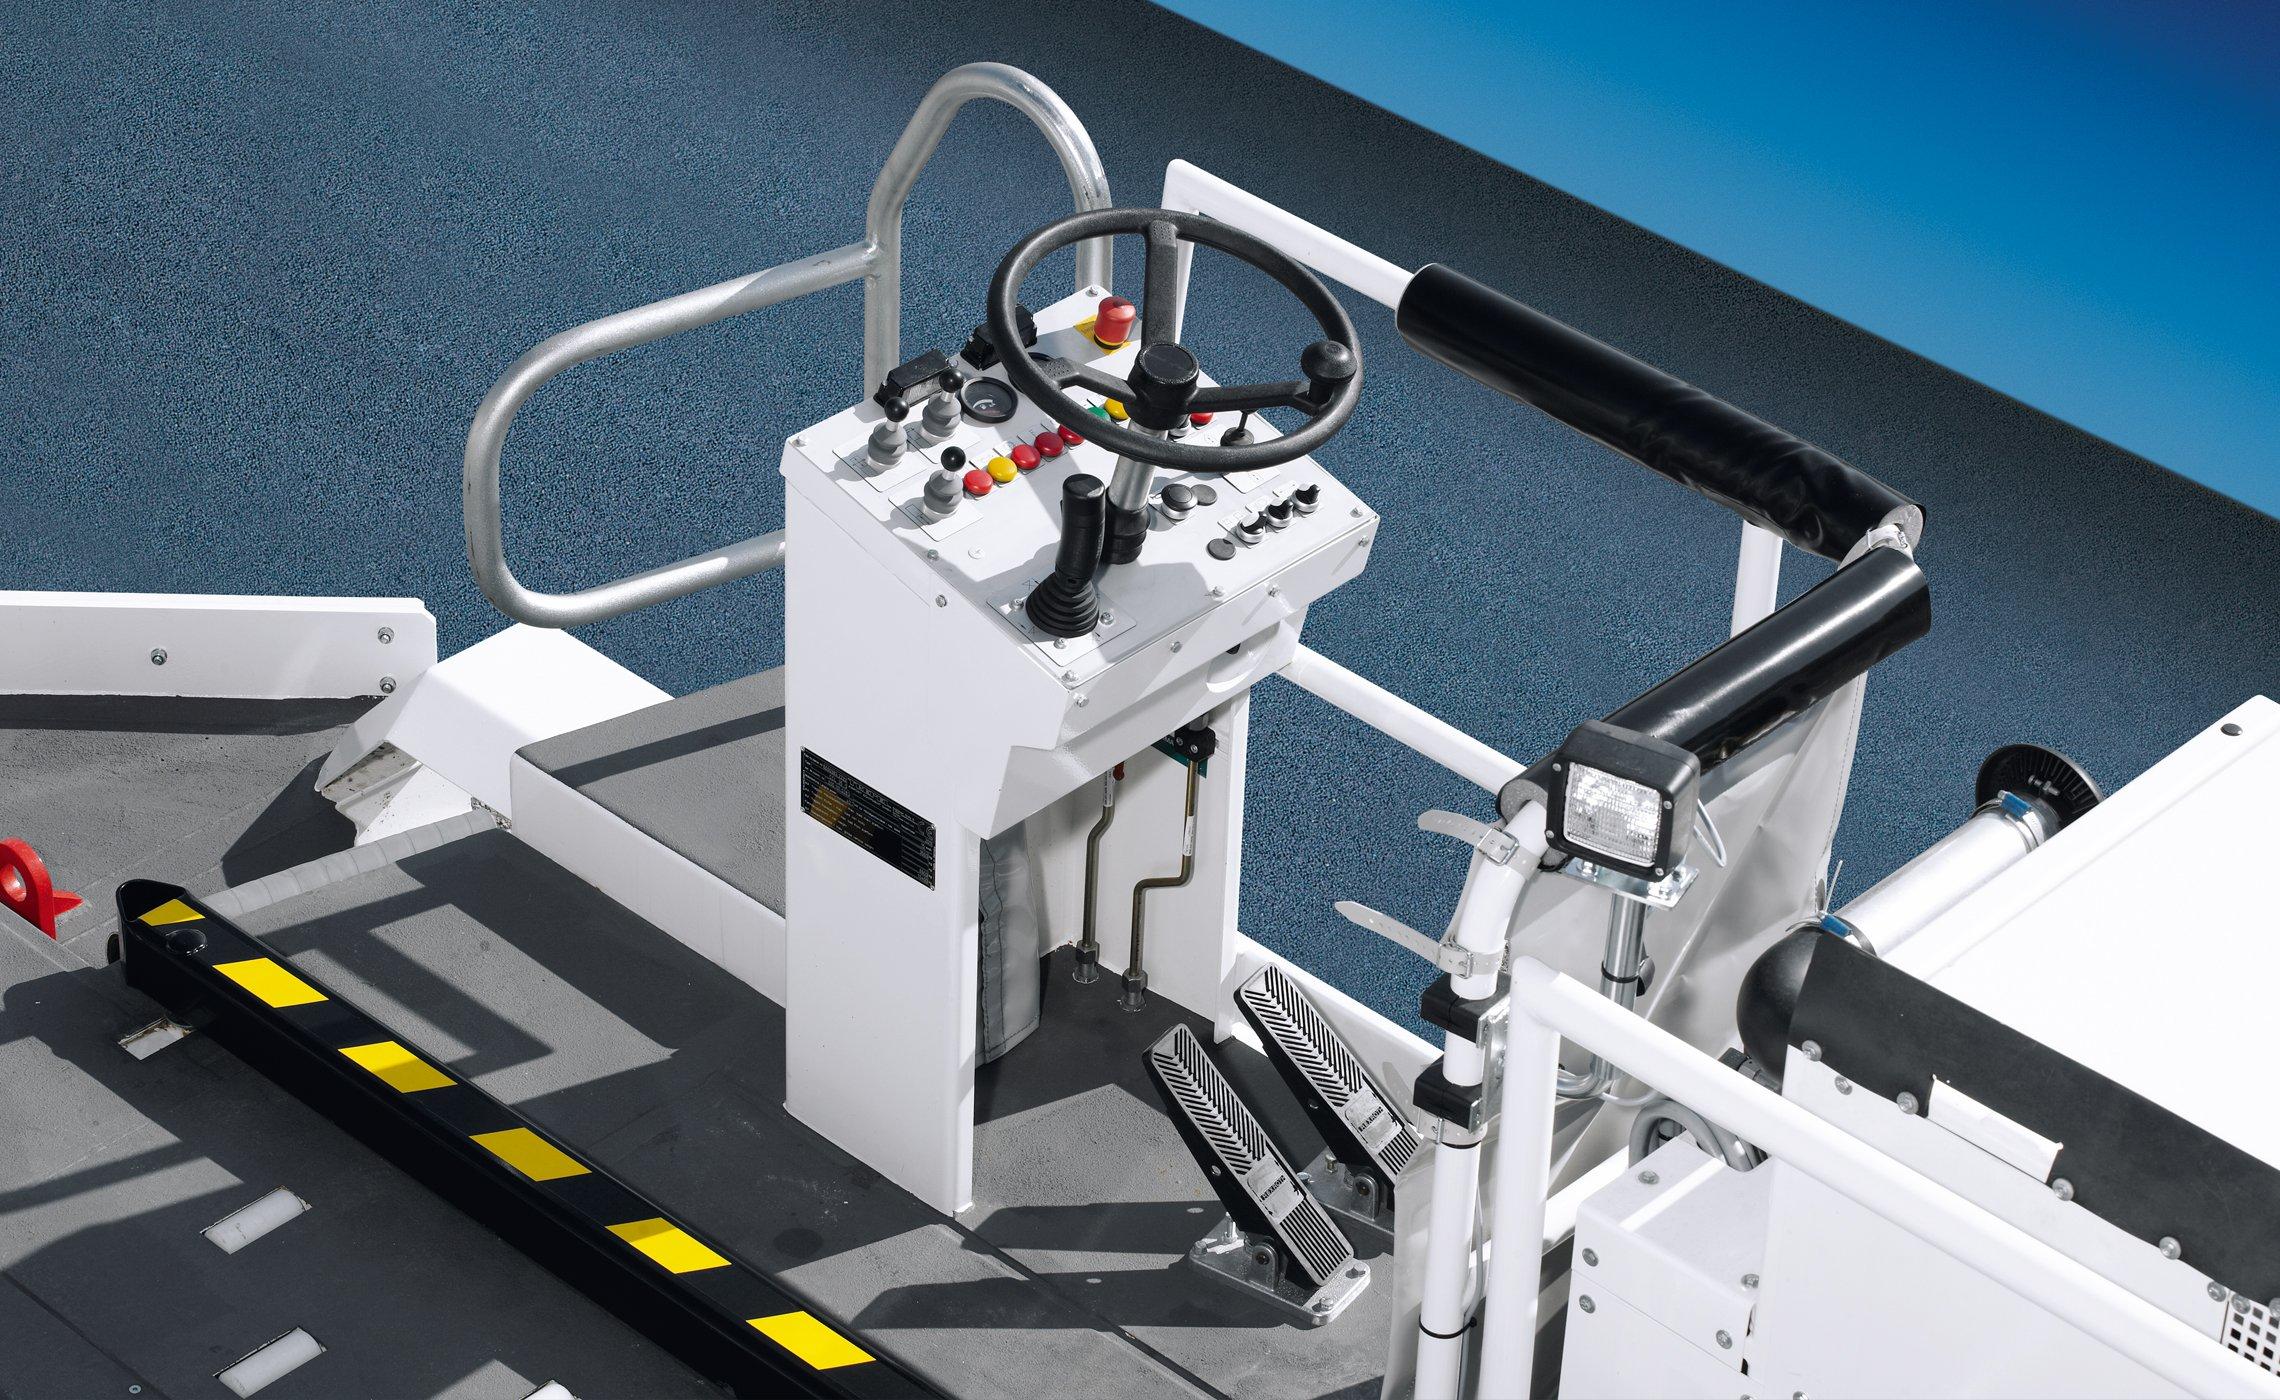 Trepel airport equipment loader transporter ccl35 s